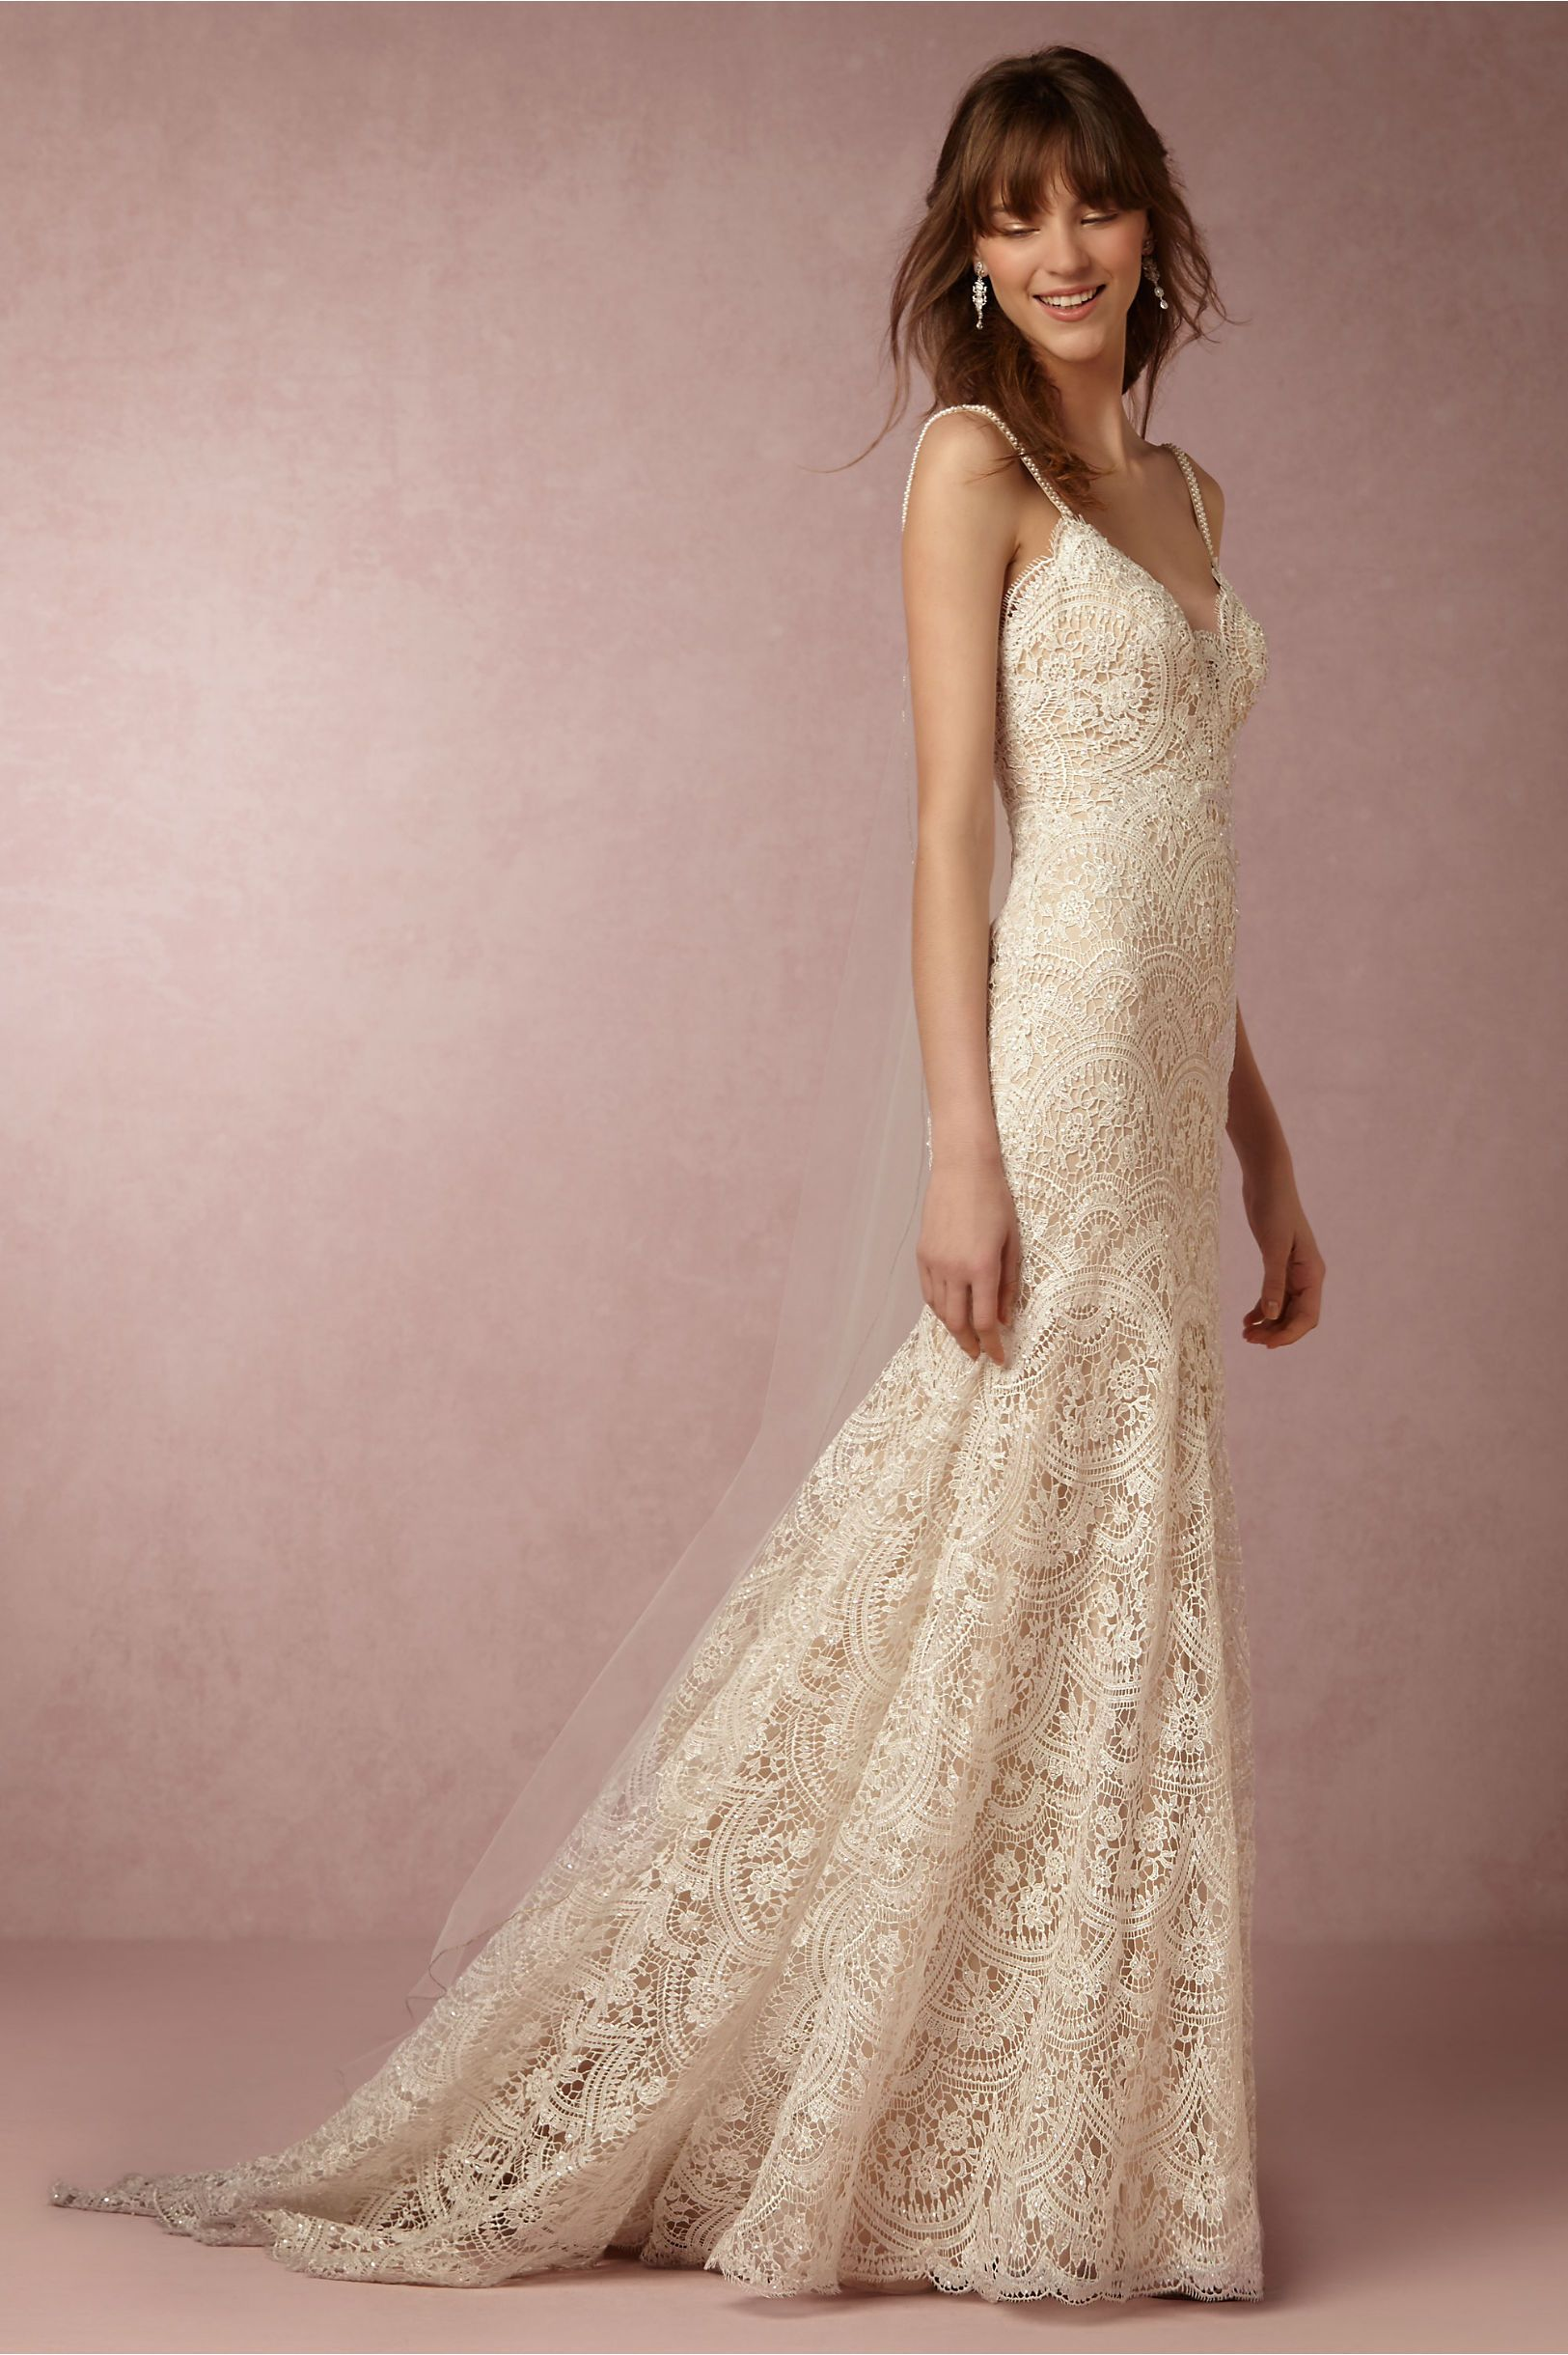 BHLDN Elise Gown in New at BHLDN | Wedding | Pinterest | Vestidos ...